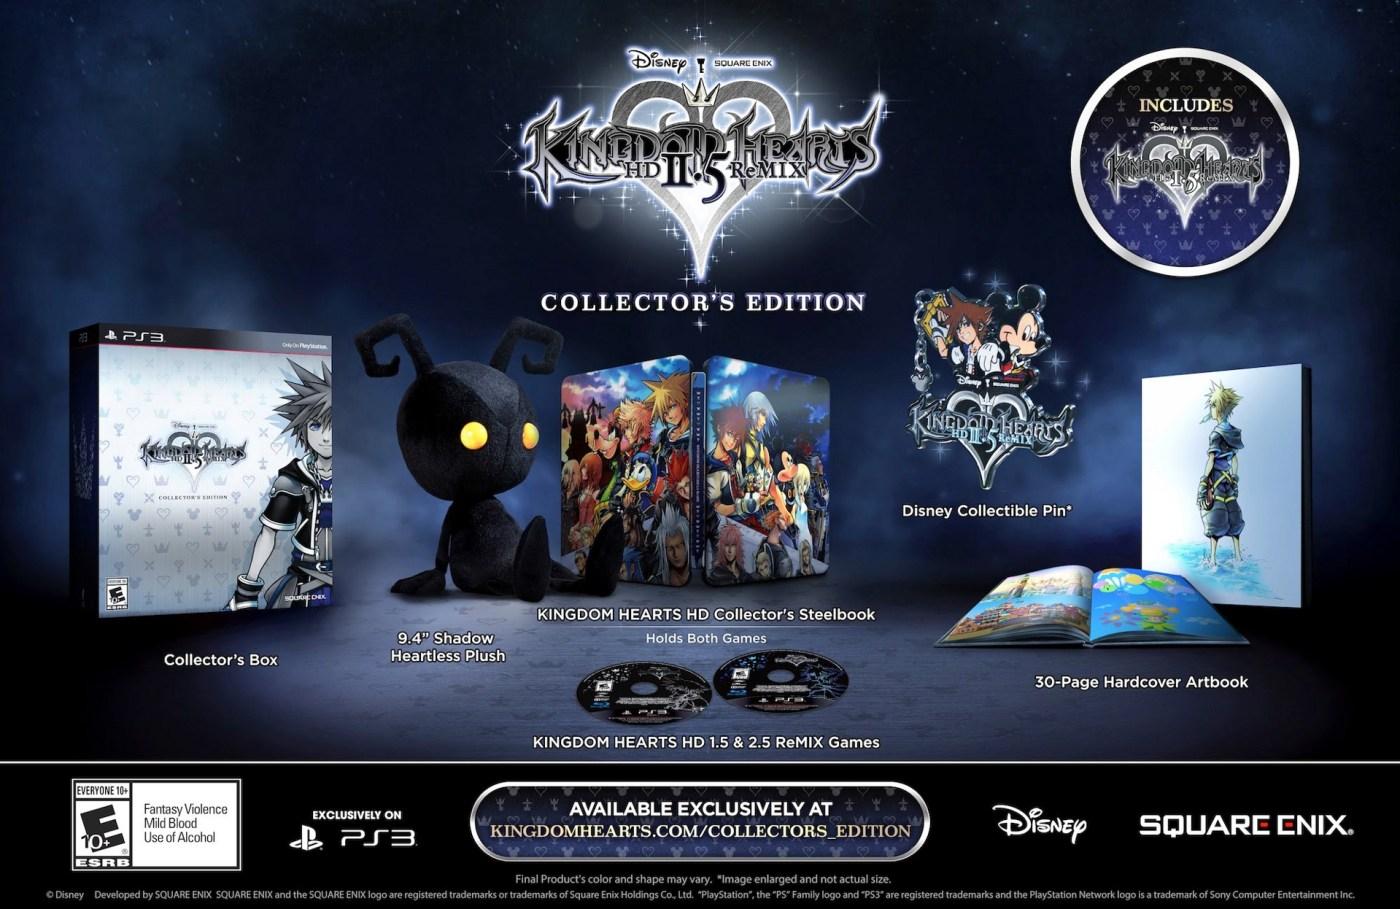 Kingdom-Hearts-HD-2.5-ReMIX collector's edition